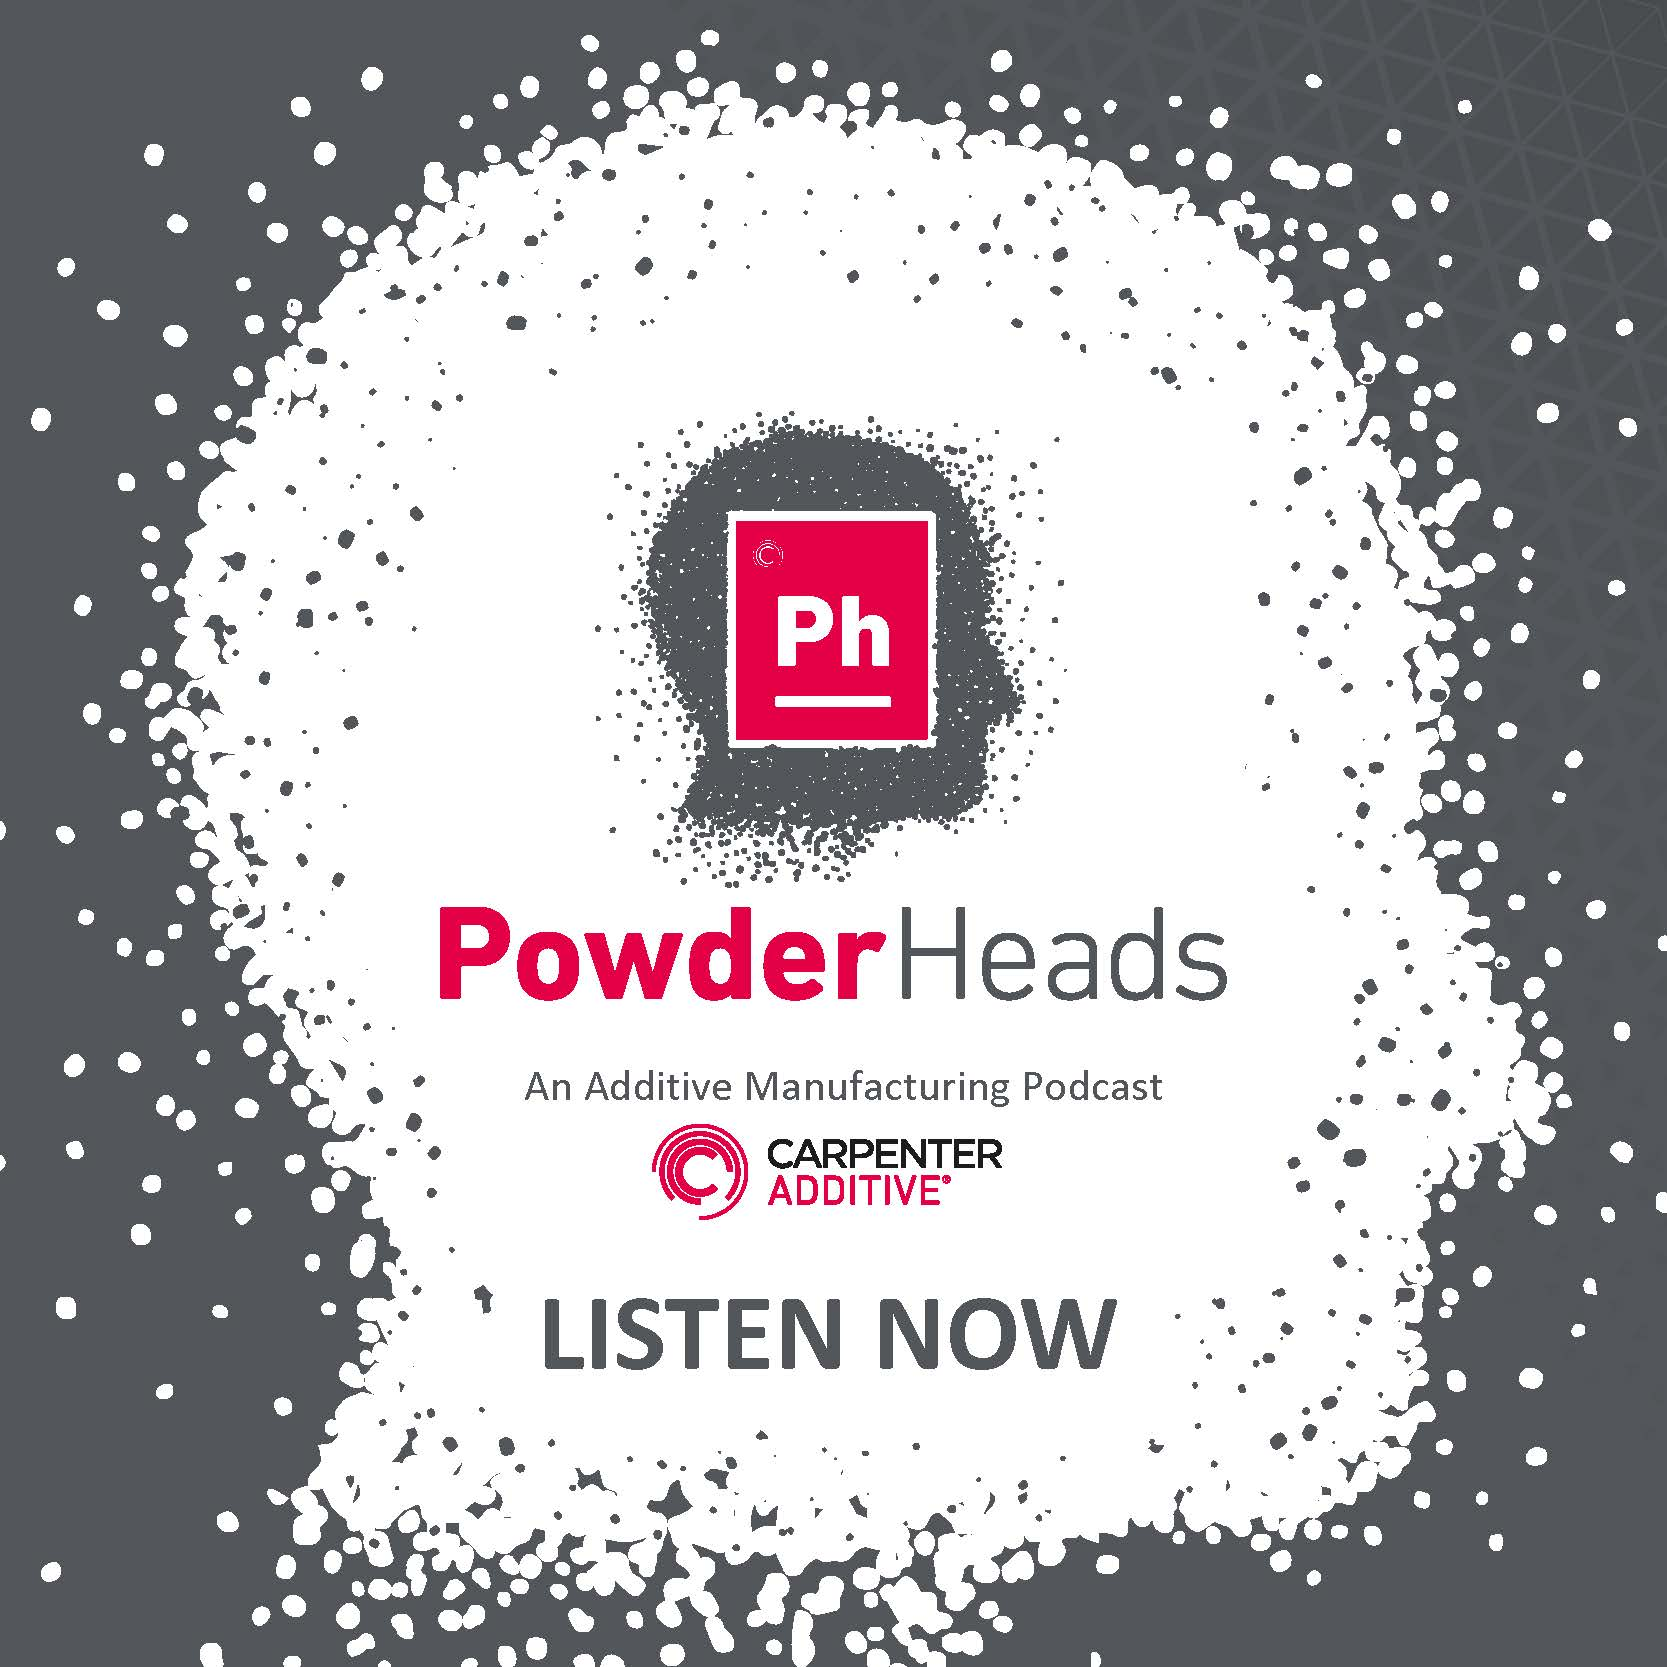 carpenter-additive-powerheads-square-ad_Page_1